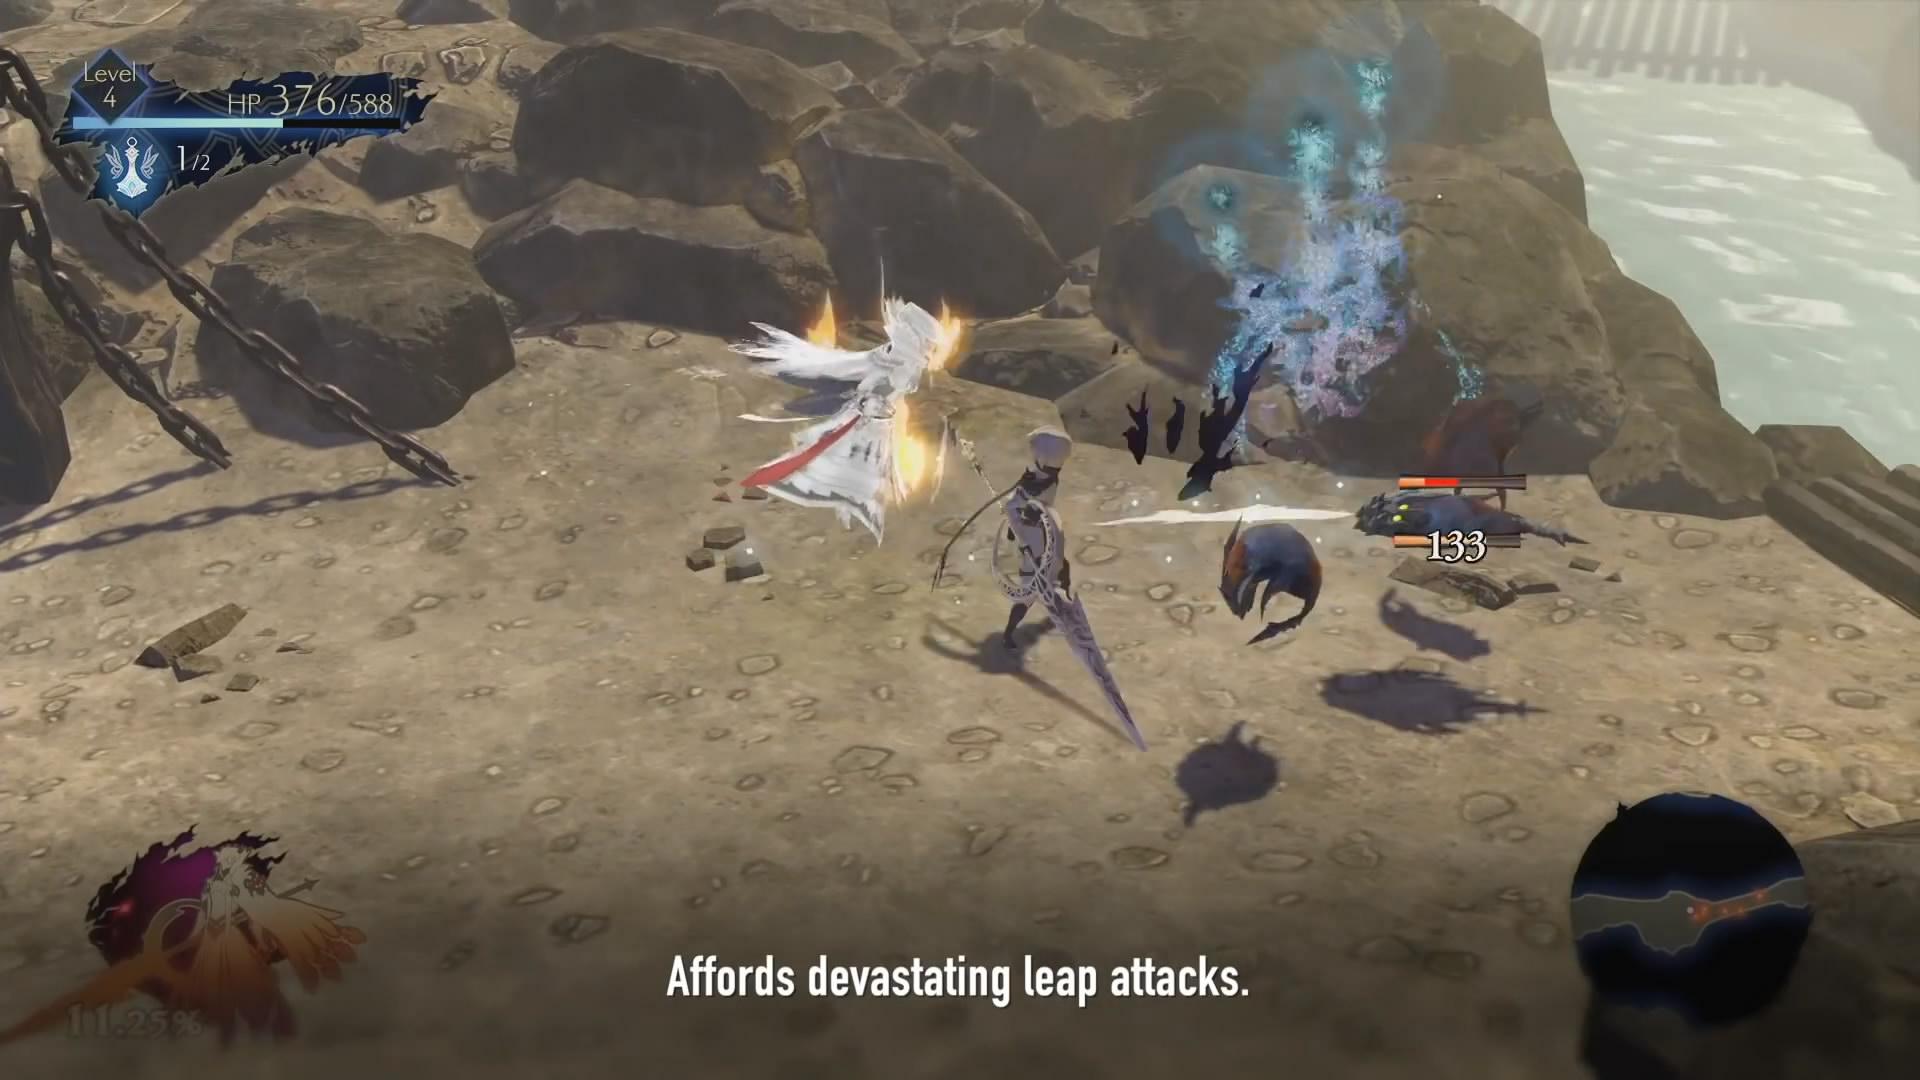 ARPG新作《鬼哭邦》新视频 游戏将于8月22日发售